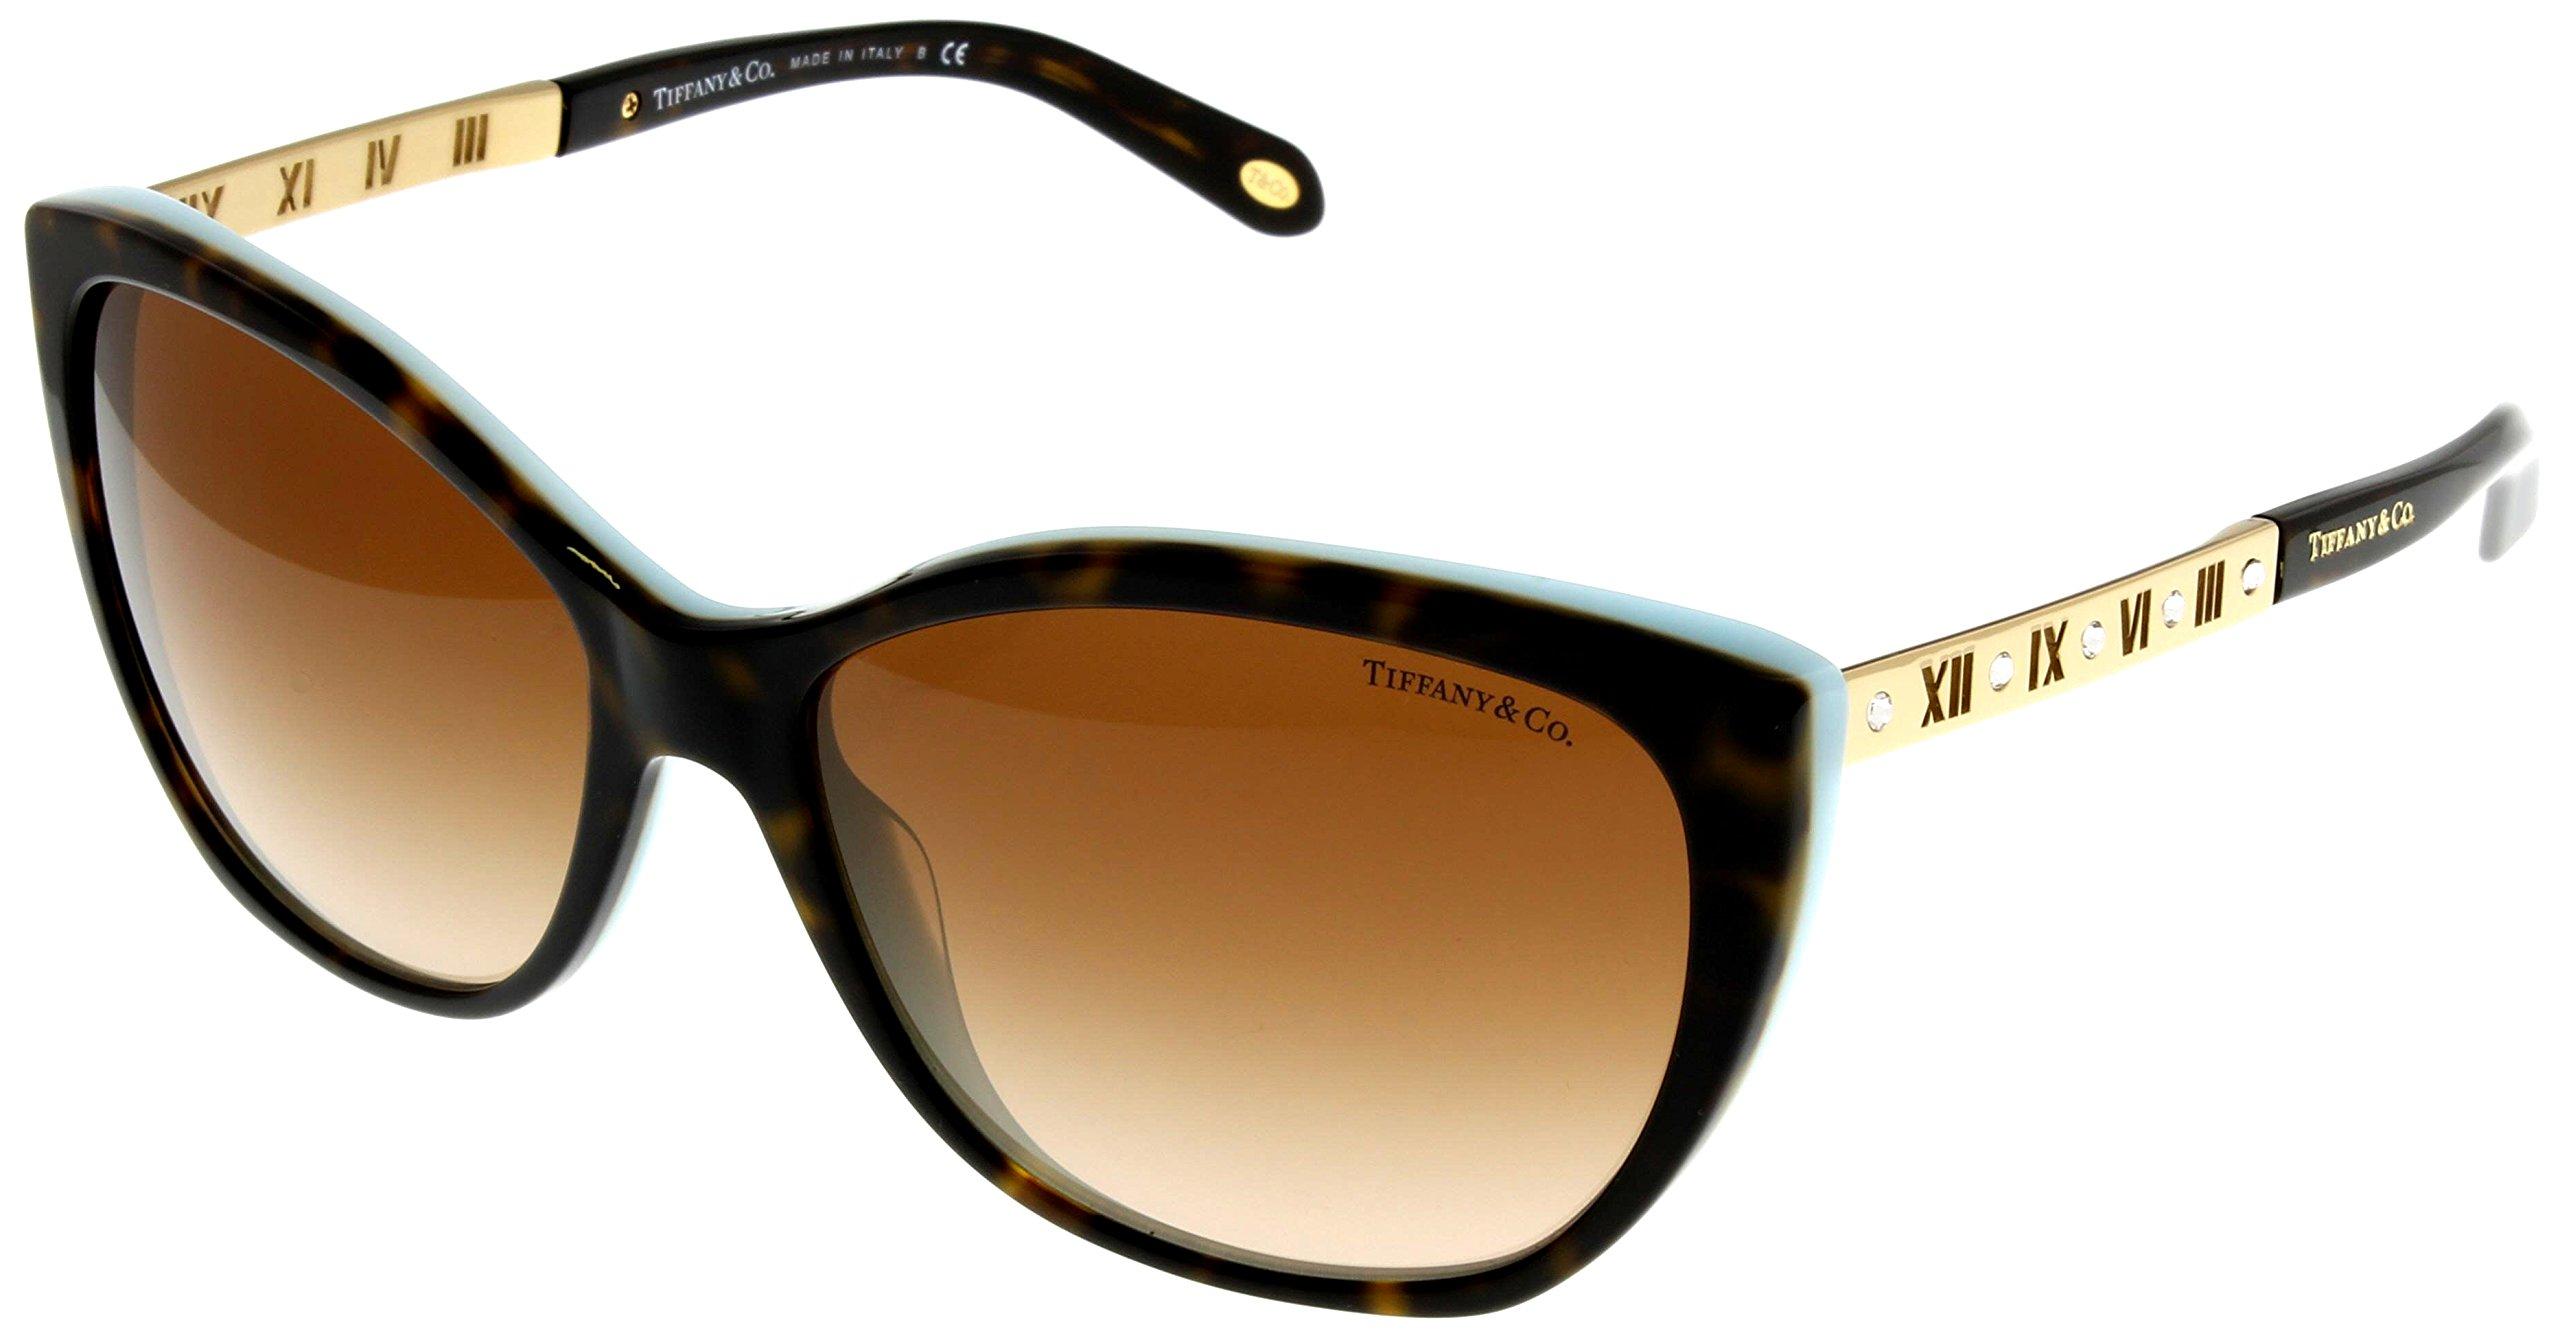 Tiffany & Co Sunglasses Womens Havana Butterfly TF4094B 81343B